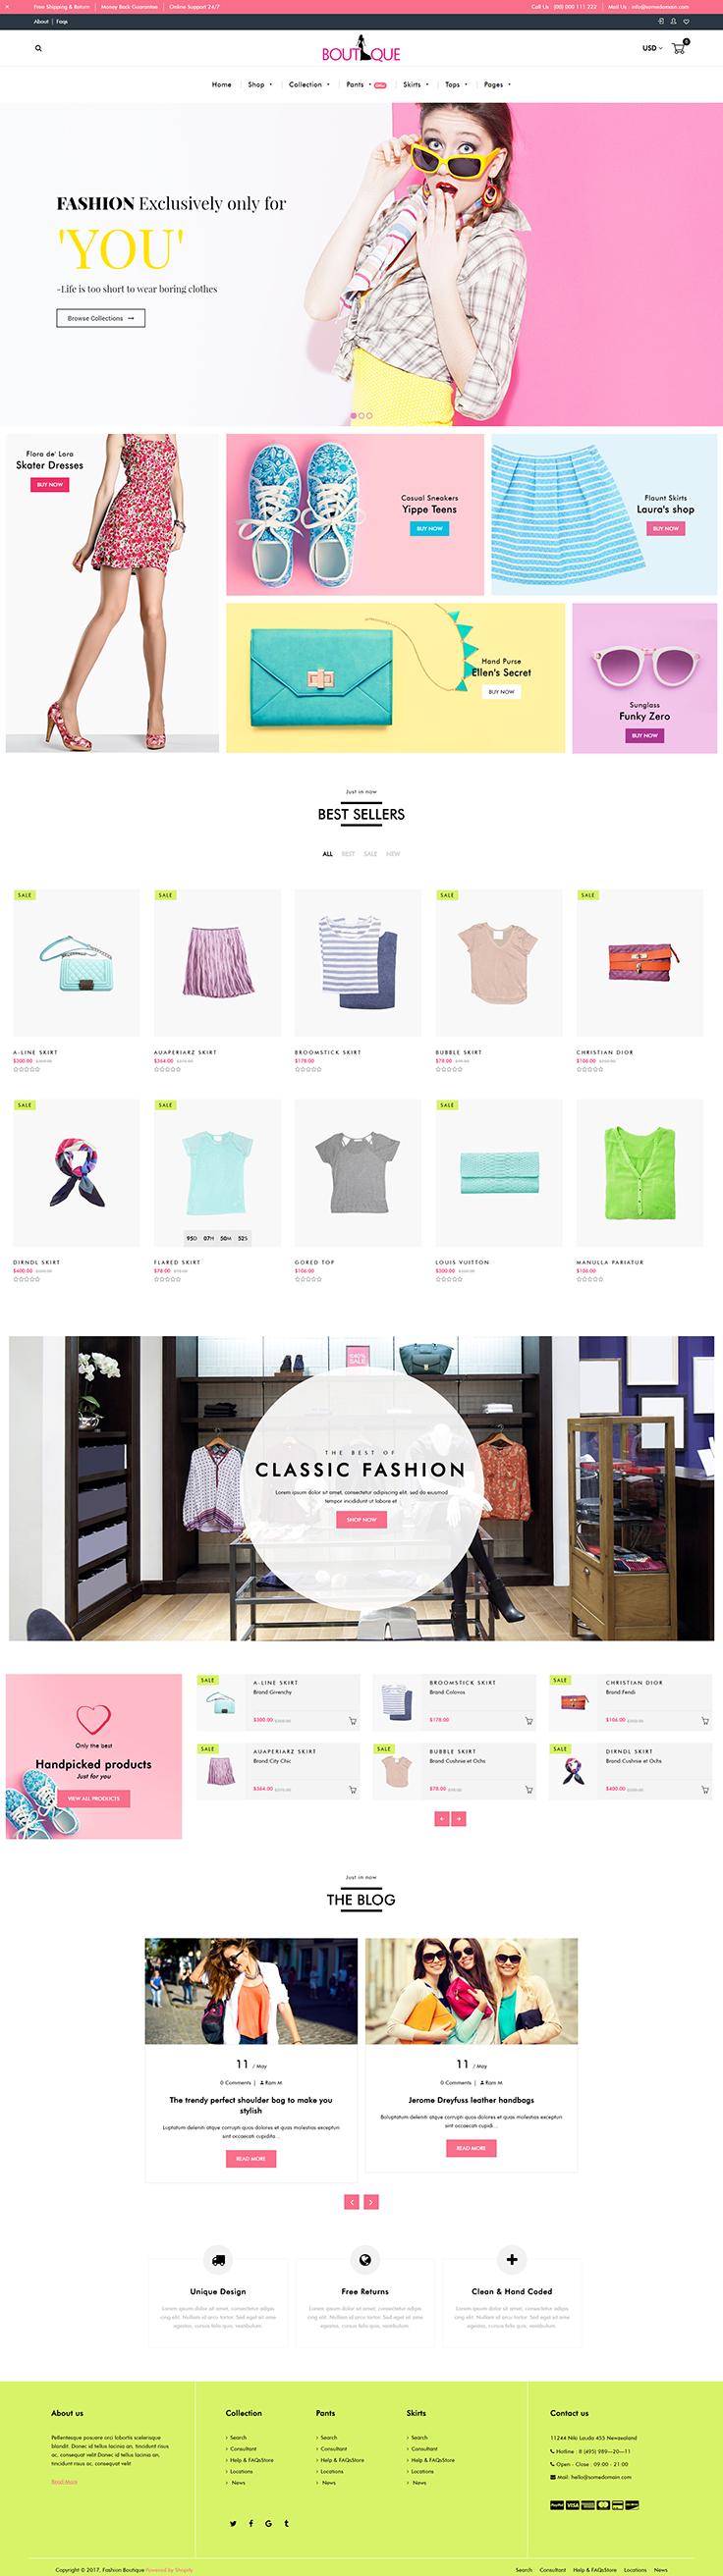 Boutique Shopify Fashion Shopify Website Design Ecommerce Web Design Shopify Design